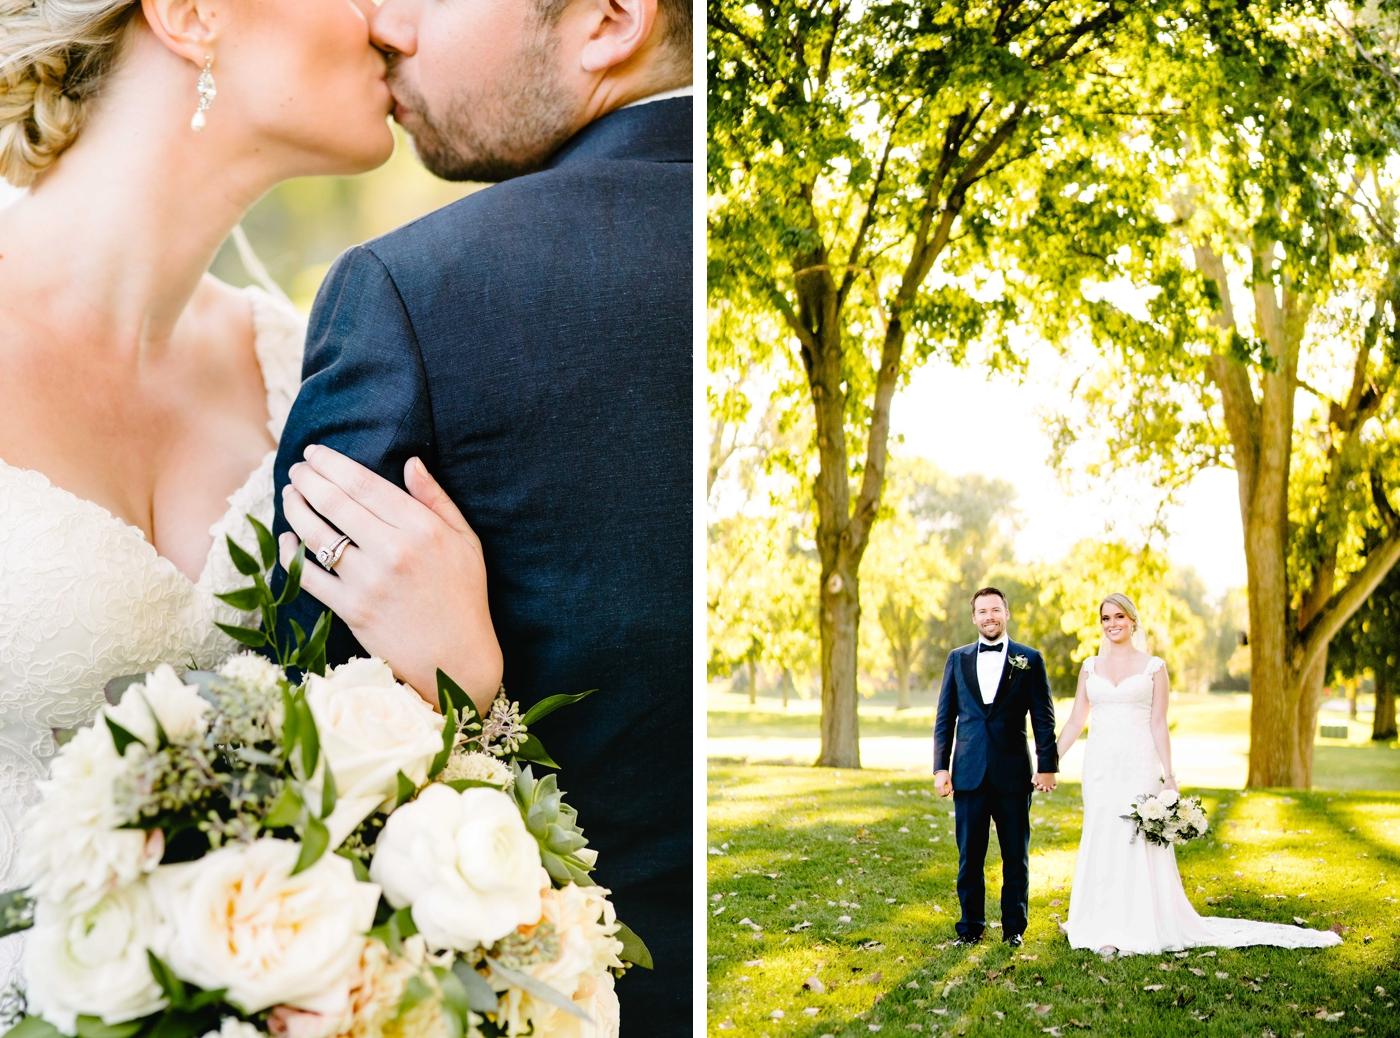 lake-geneva-fine-art-wedding-photography-mesley51